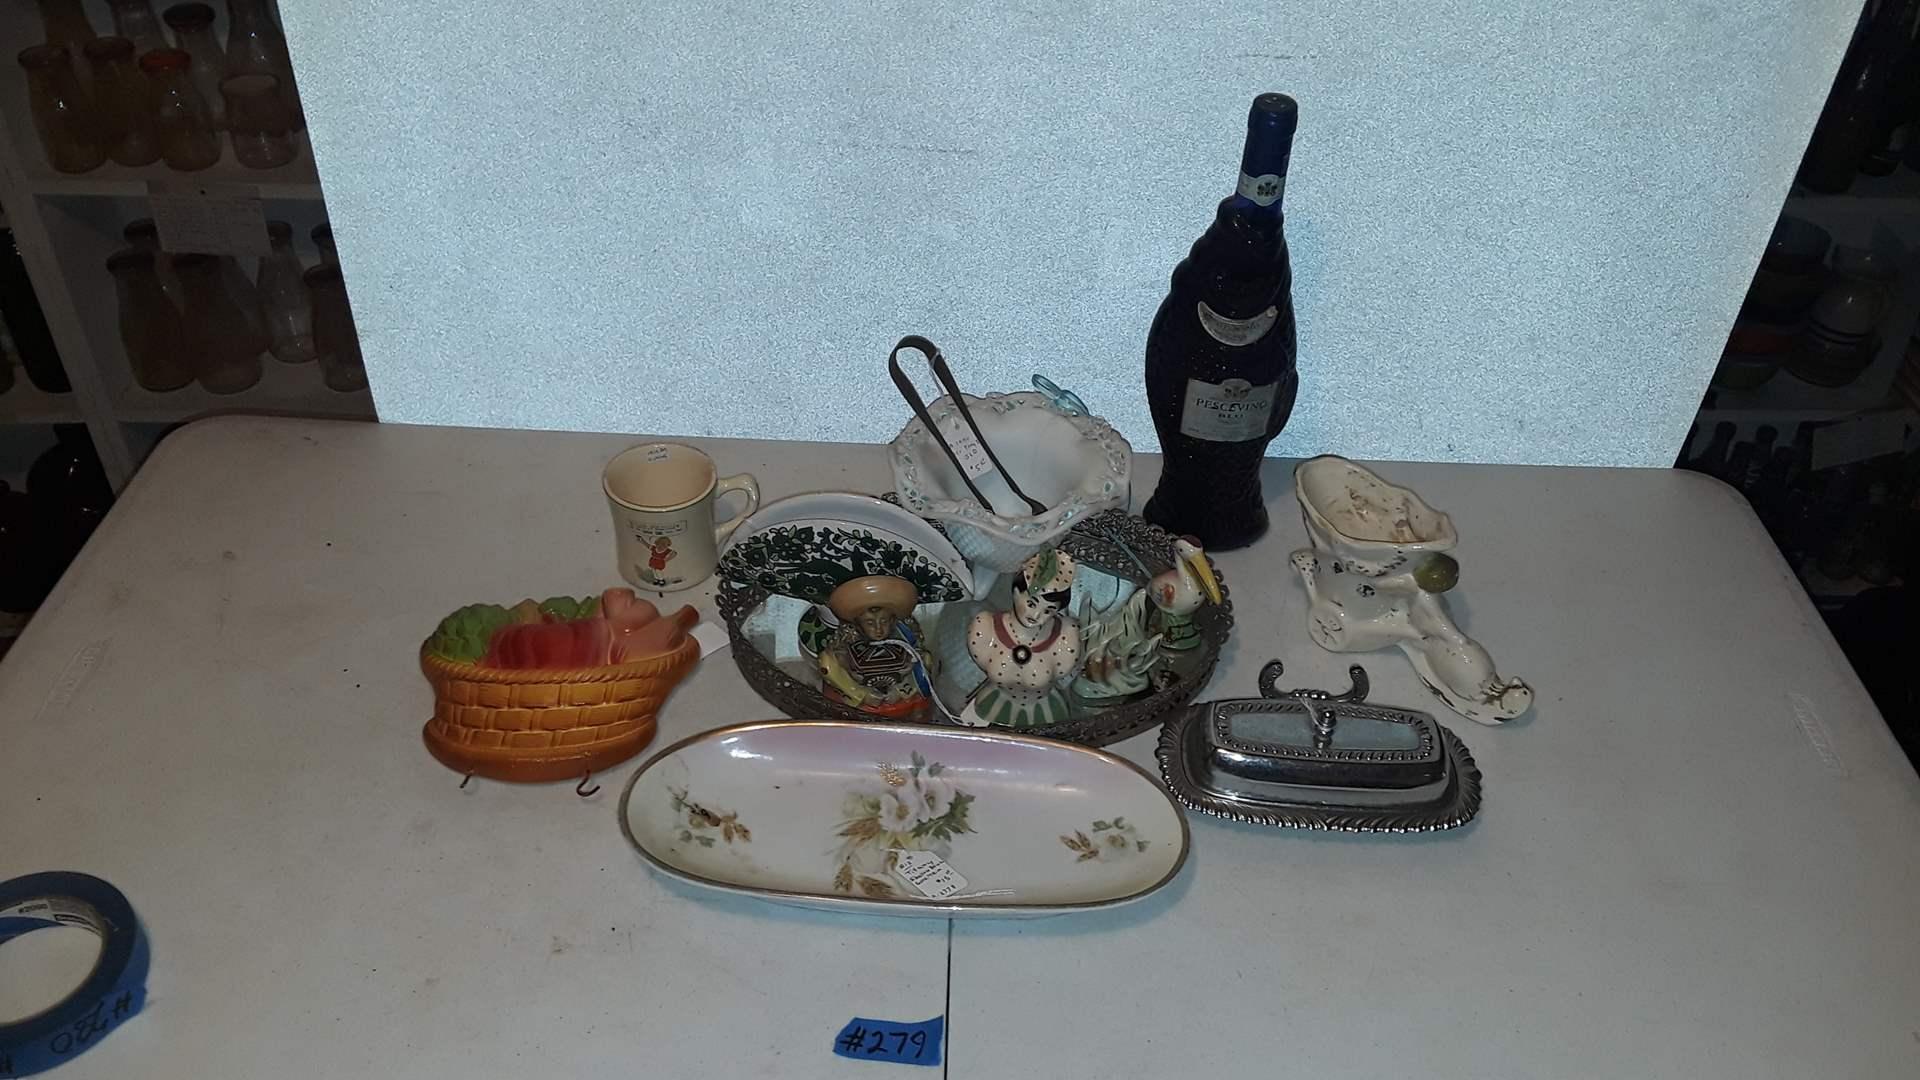 Lot # 279 PESCAVINO WINE BOTTLE, VINTAGE MIRROR AND FIGURINES